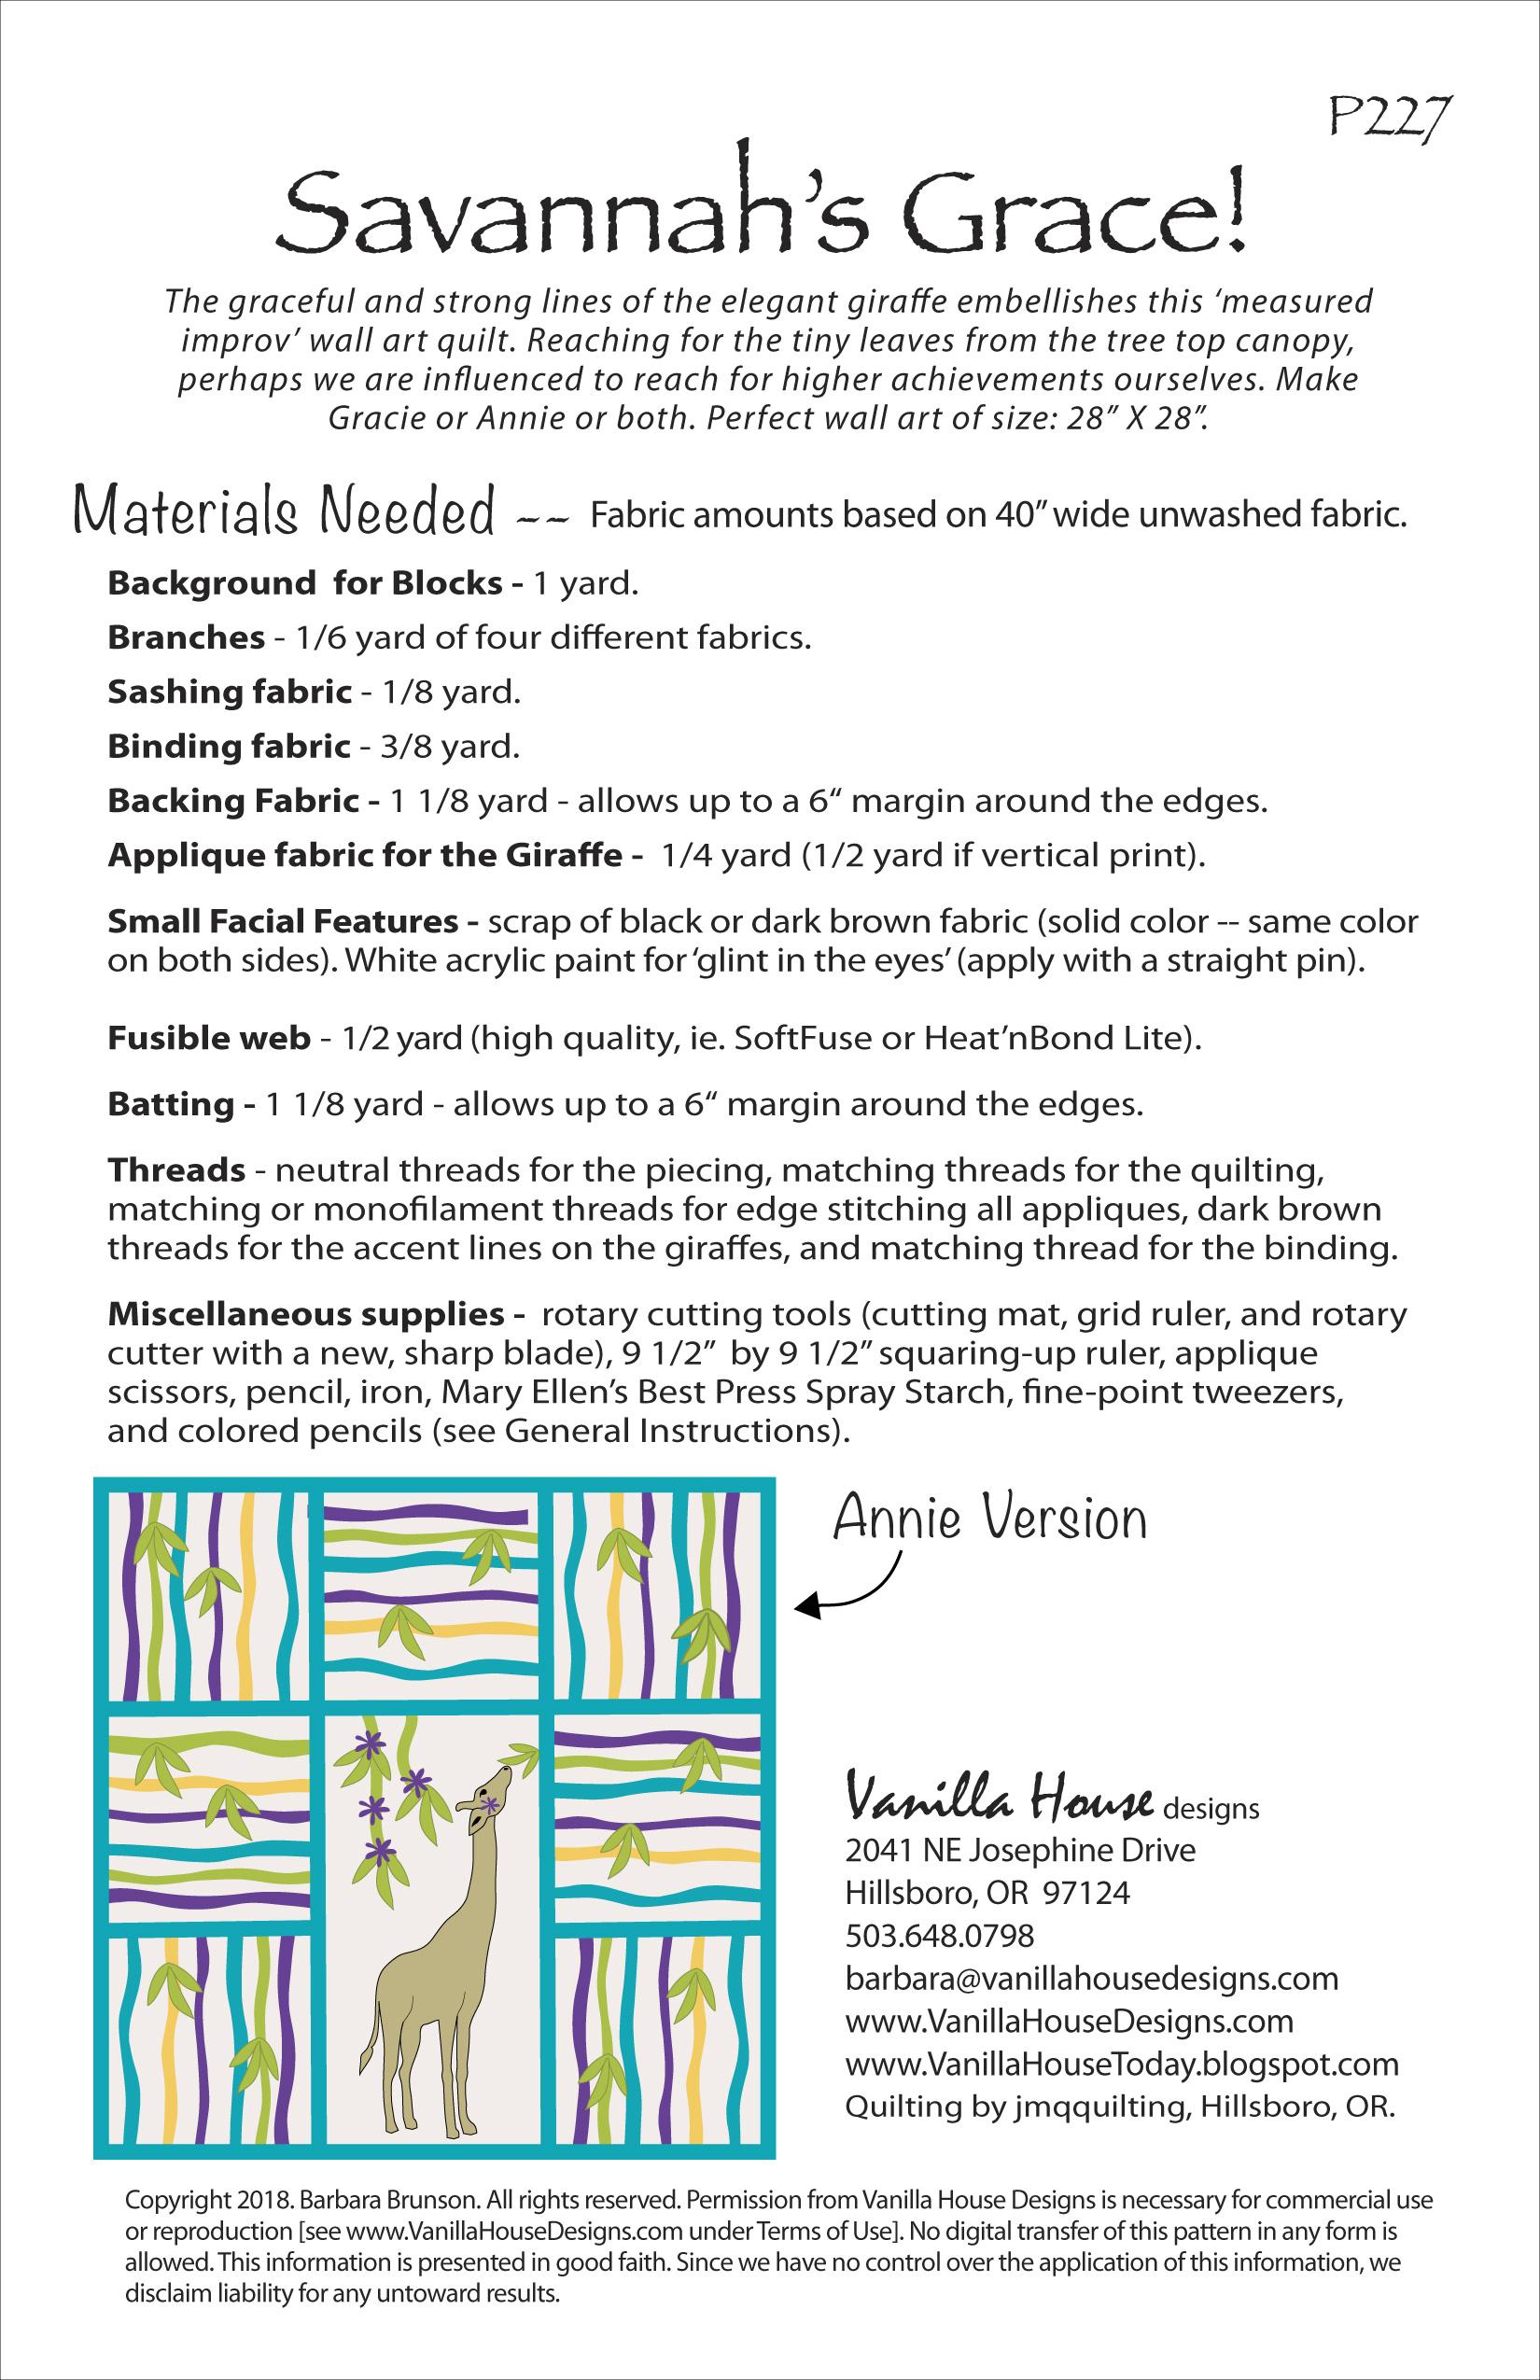 P227 Savannah's Grace | Vanilla House Designs